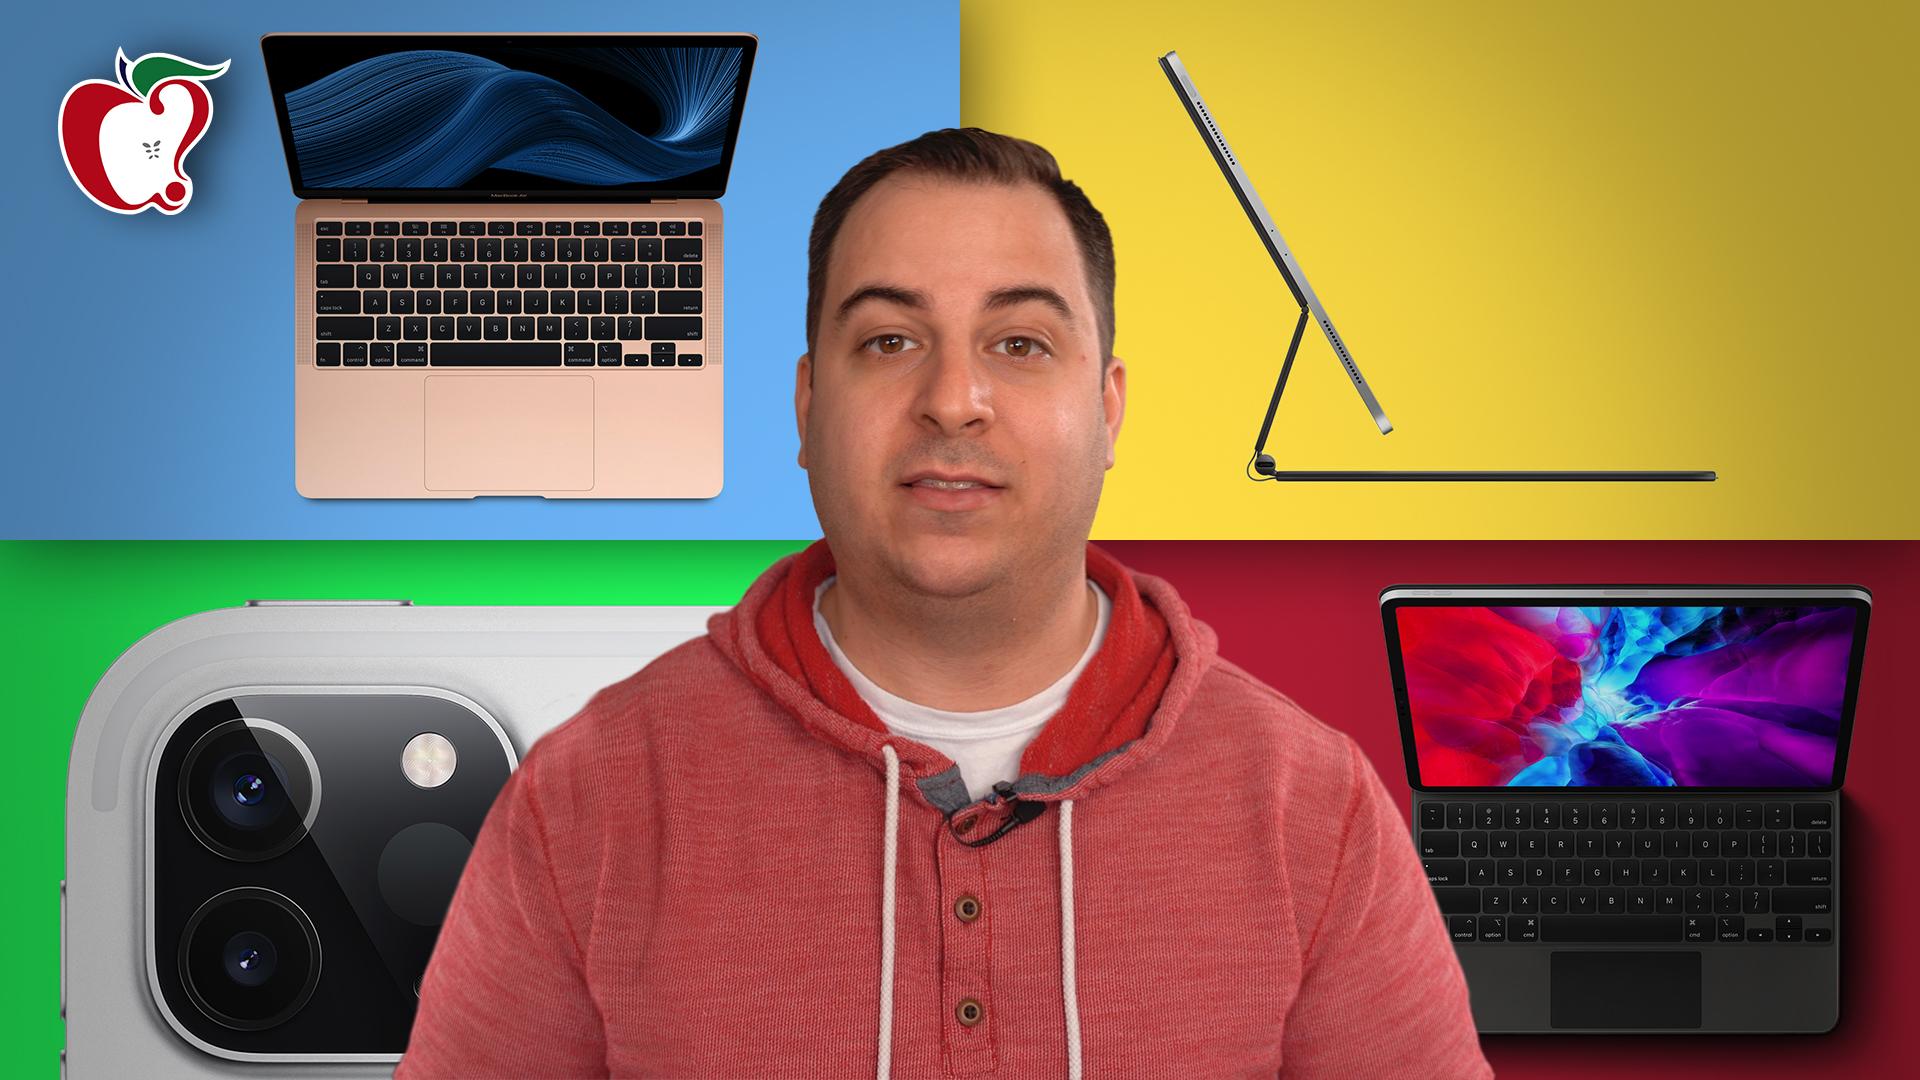 Top Stories: New iPad Pro, MacBook Air, Powerbeats, and More